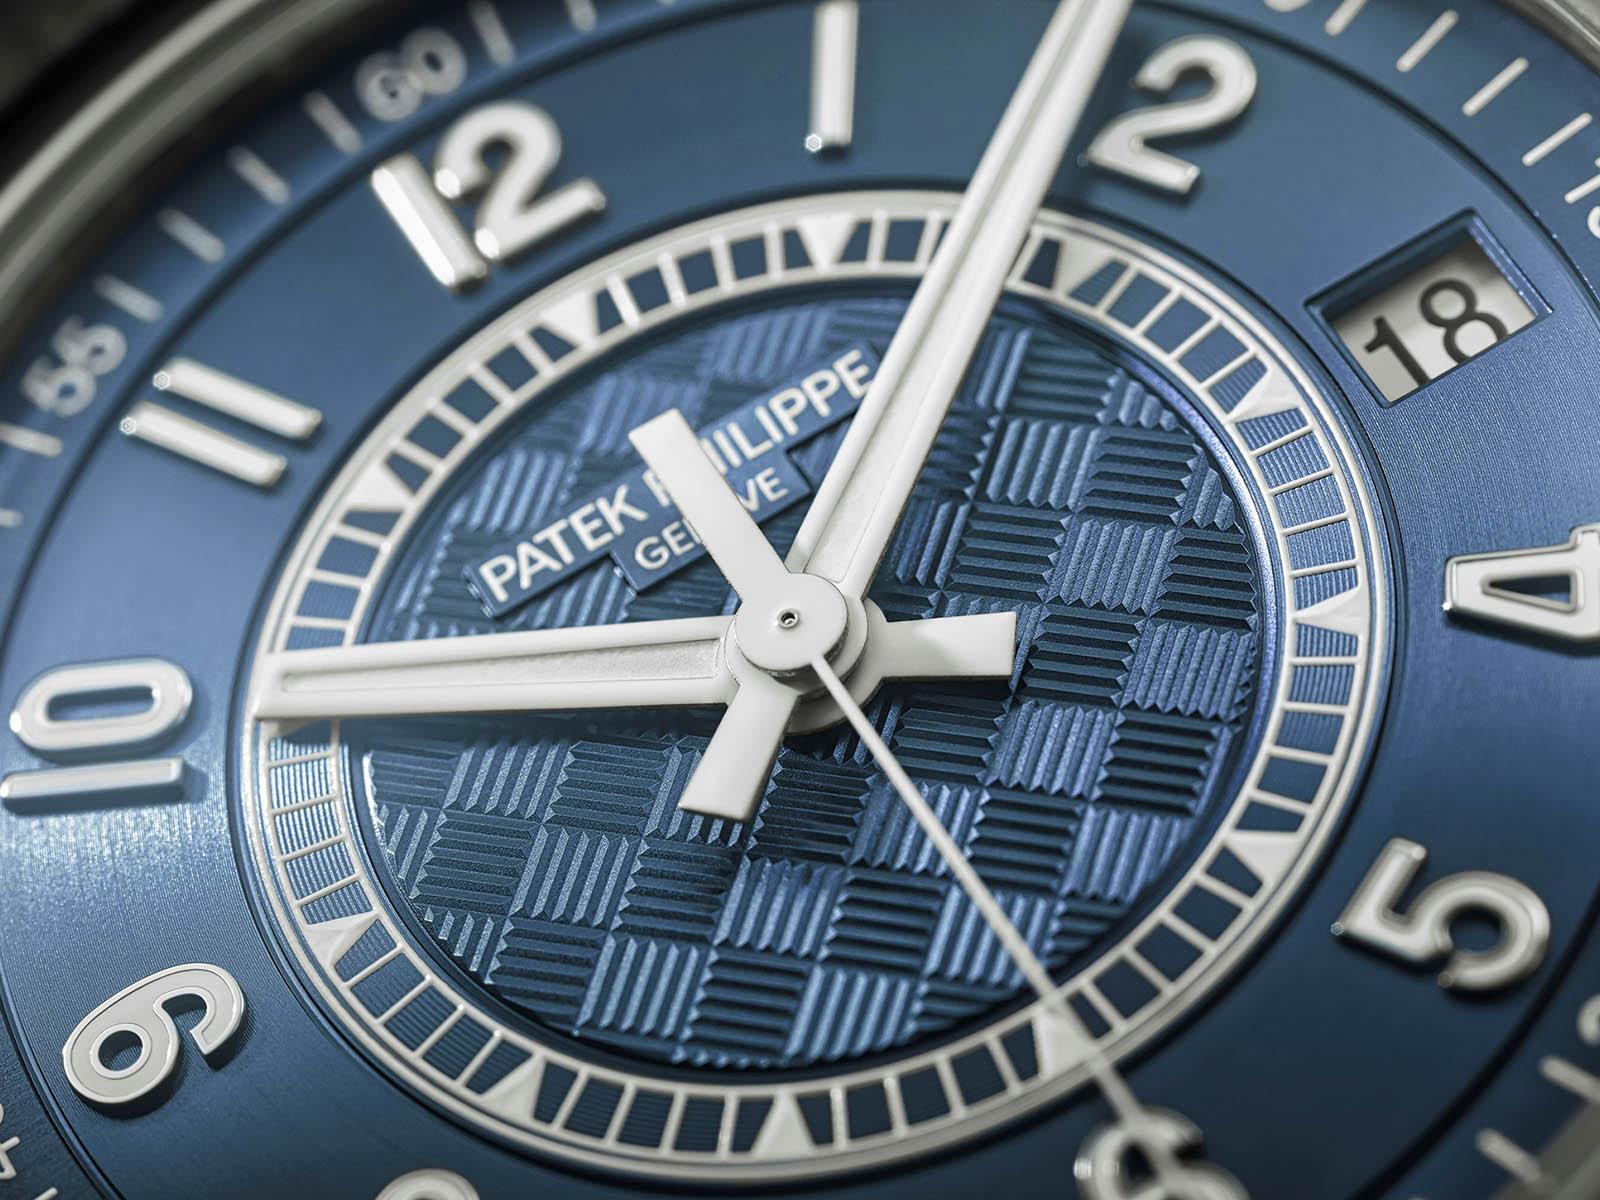 6007a-001-patek-philippe-calatrava-6007a-limited-edition-10.jpg